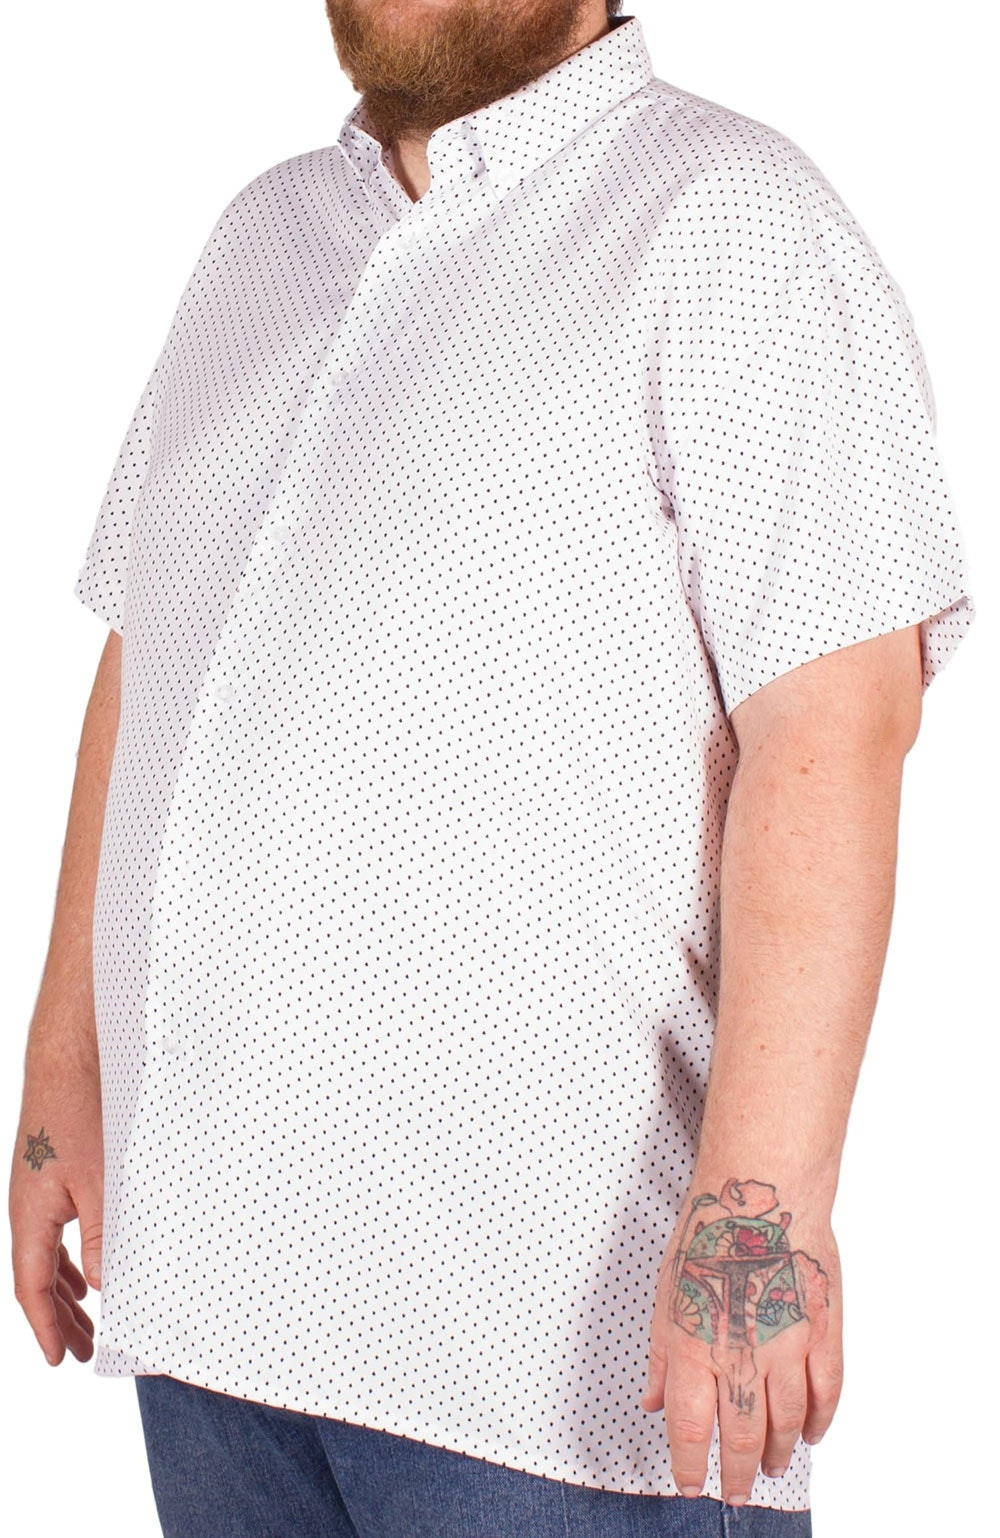 Fitzgerald Club Print Short Sleeved Shirt